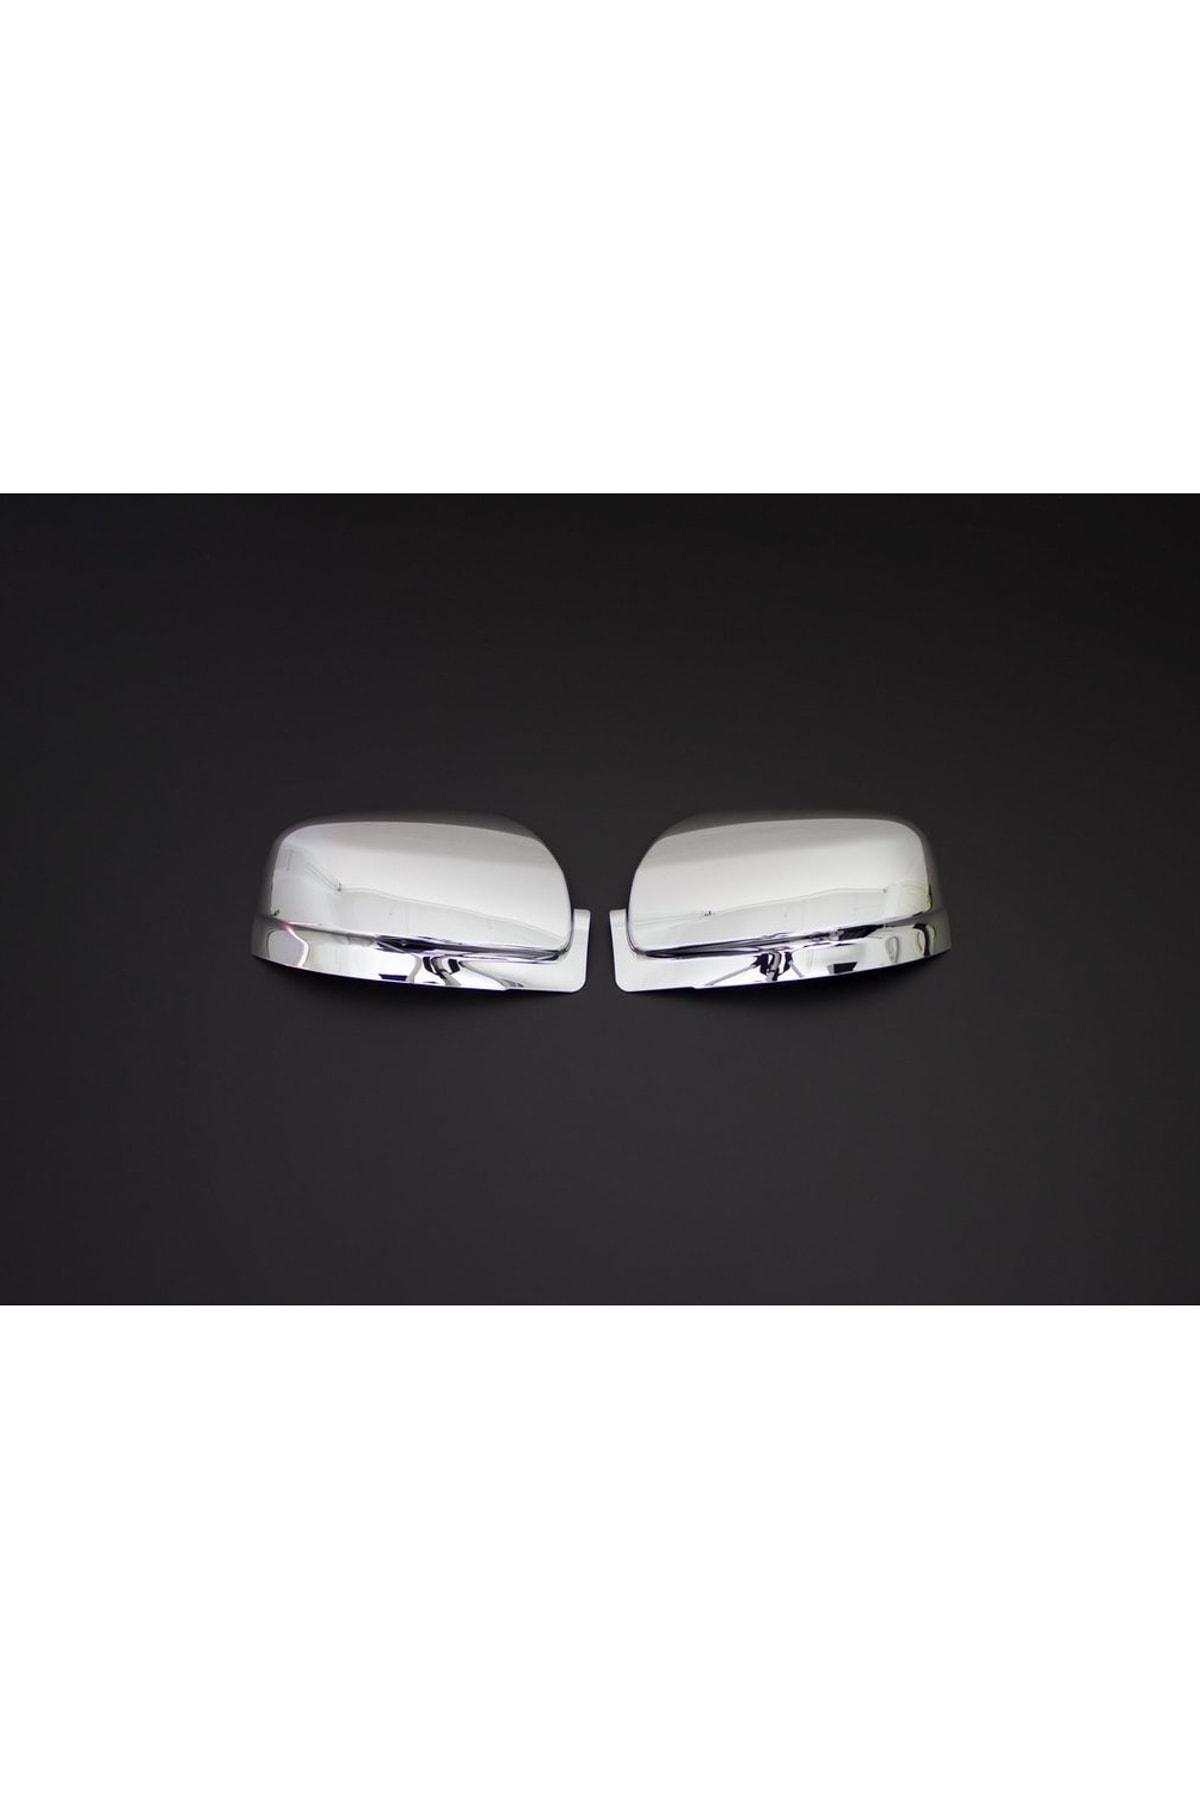 Omsa Mercedes Vito W639 Krom Ayna Kapağı 2 Prç. P.Çelik 2010-2014 1